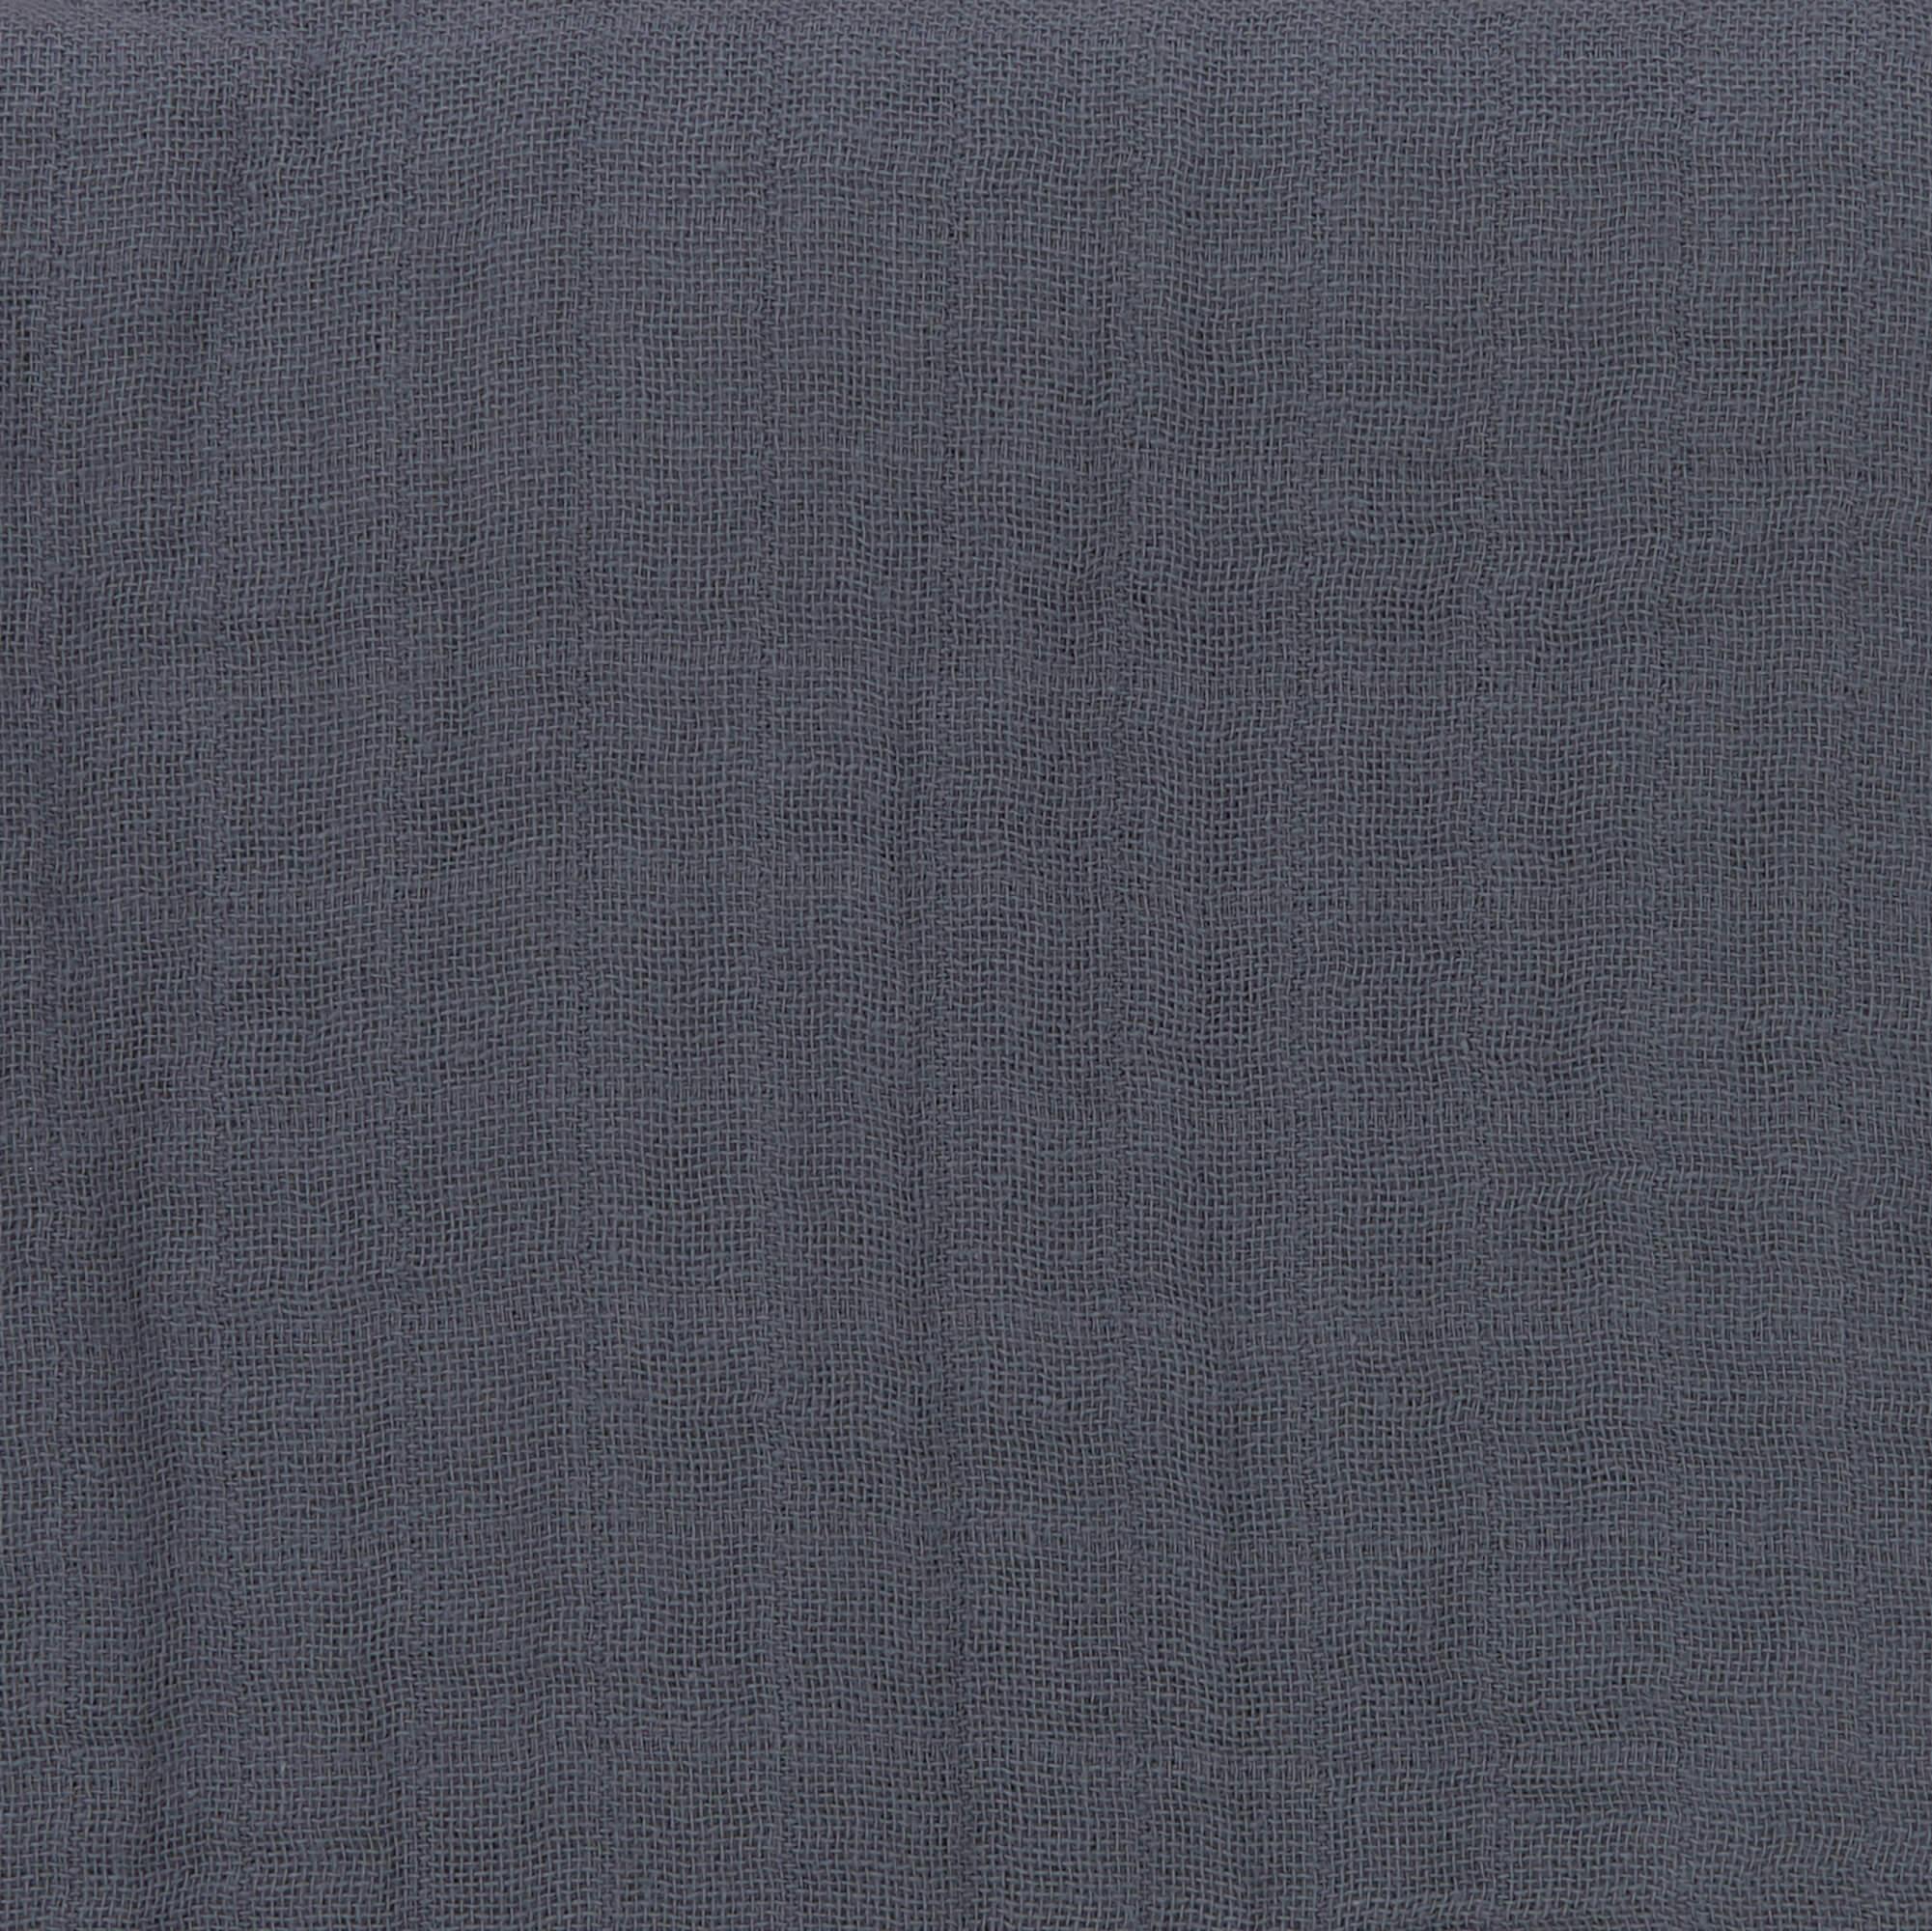 Stillschal Musselin - Navy - Lässig